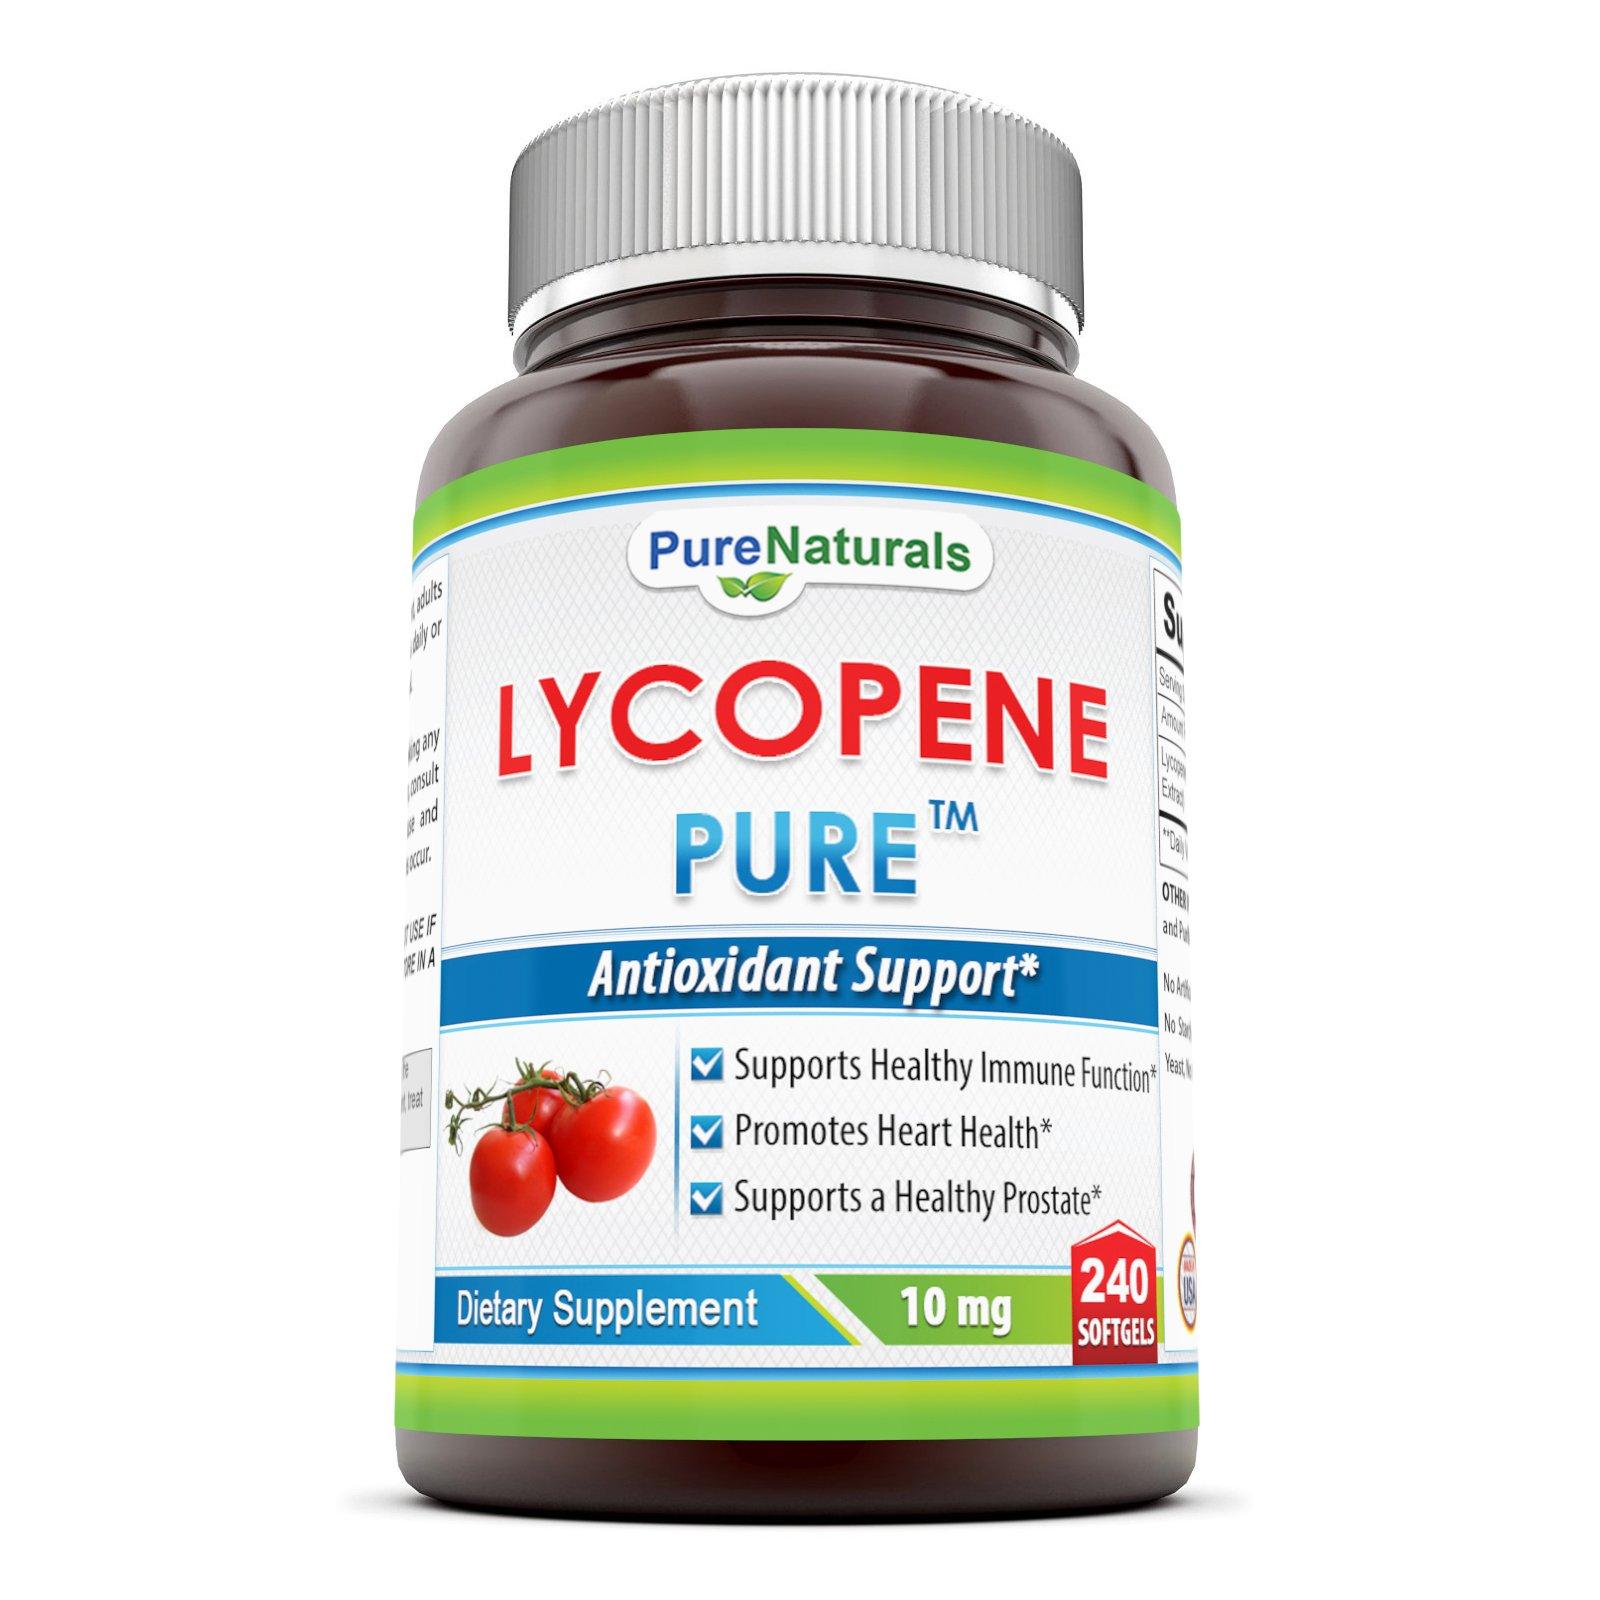 Pure Naturals lycopene Softgels, 10 mg, 240 Count